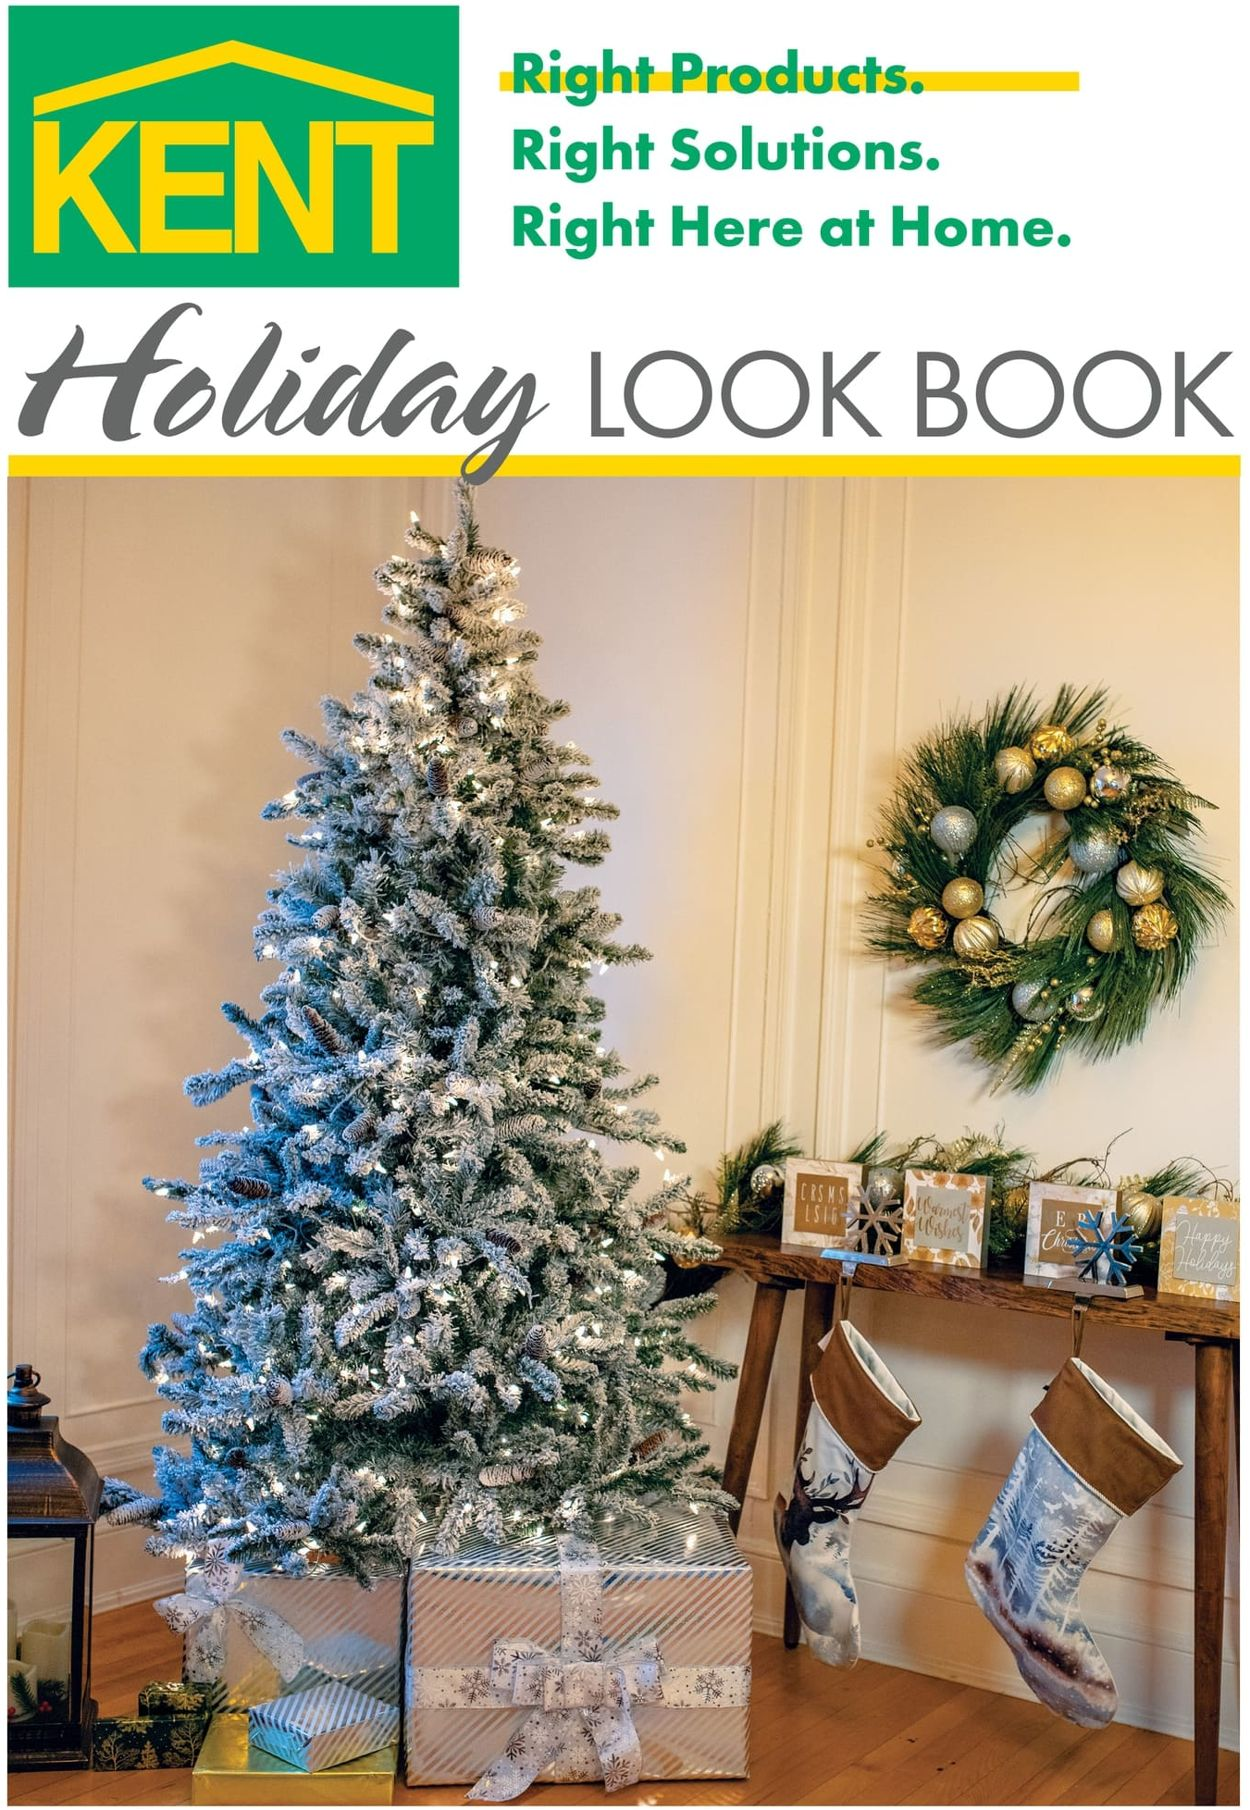 Kent - Holiday 2020 Flyer - 11/12-12/24/2020